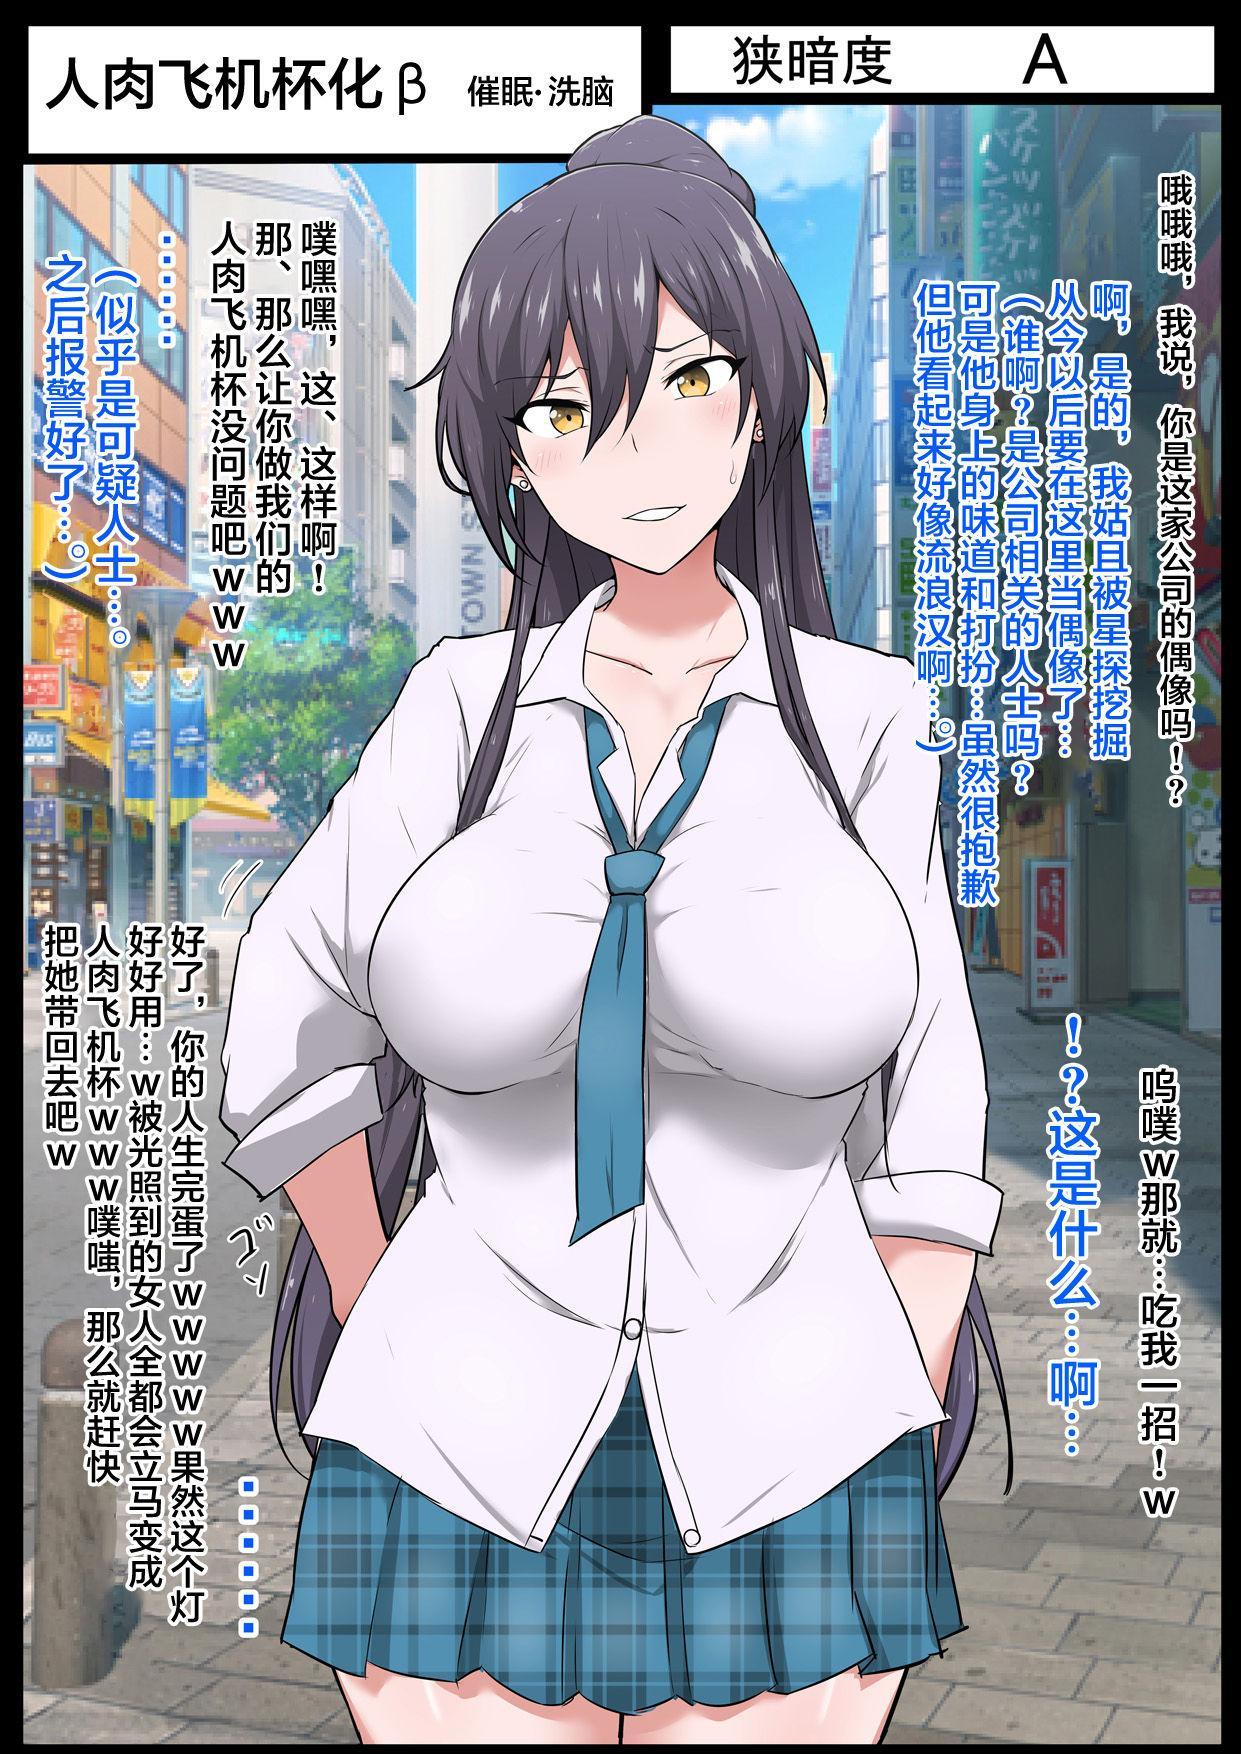 Kurakute Semai Seihekisho Vol. 2 Saimin Sennou 12